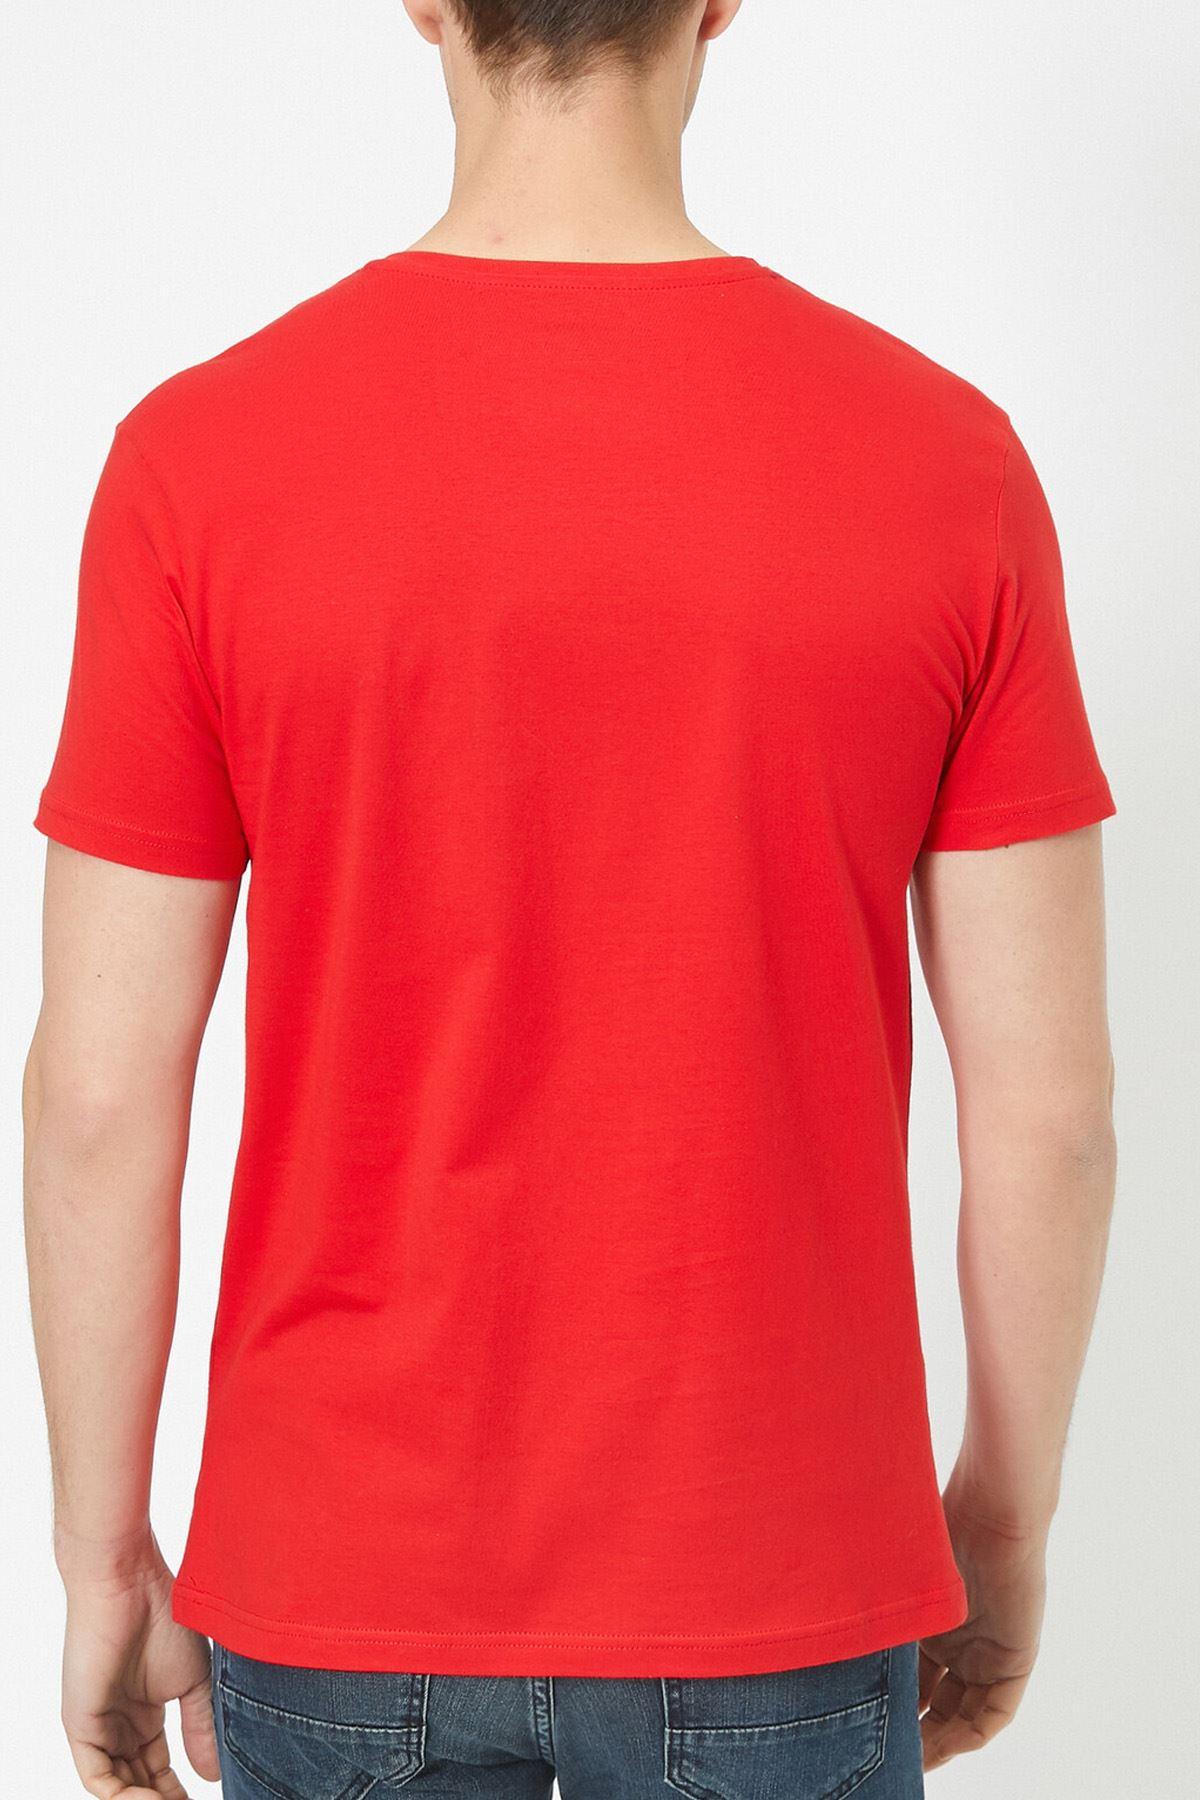 Naruto Anime 07 Kırmızı Erkek Tshirt - Tişört